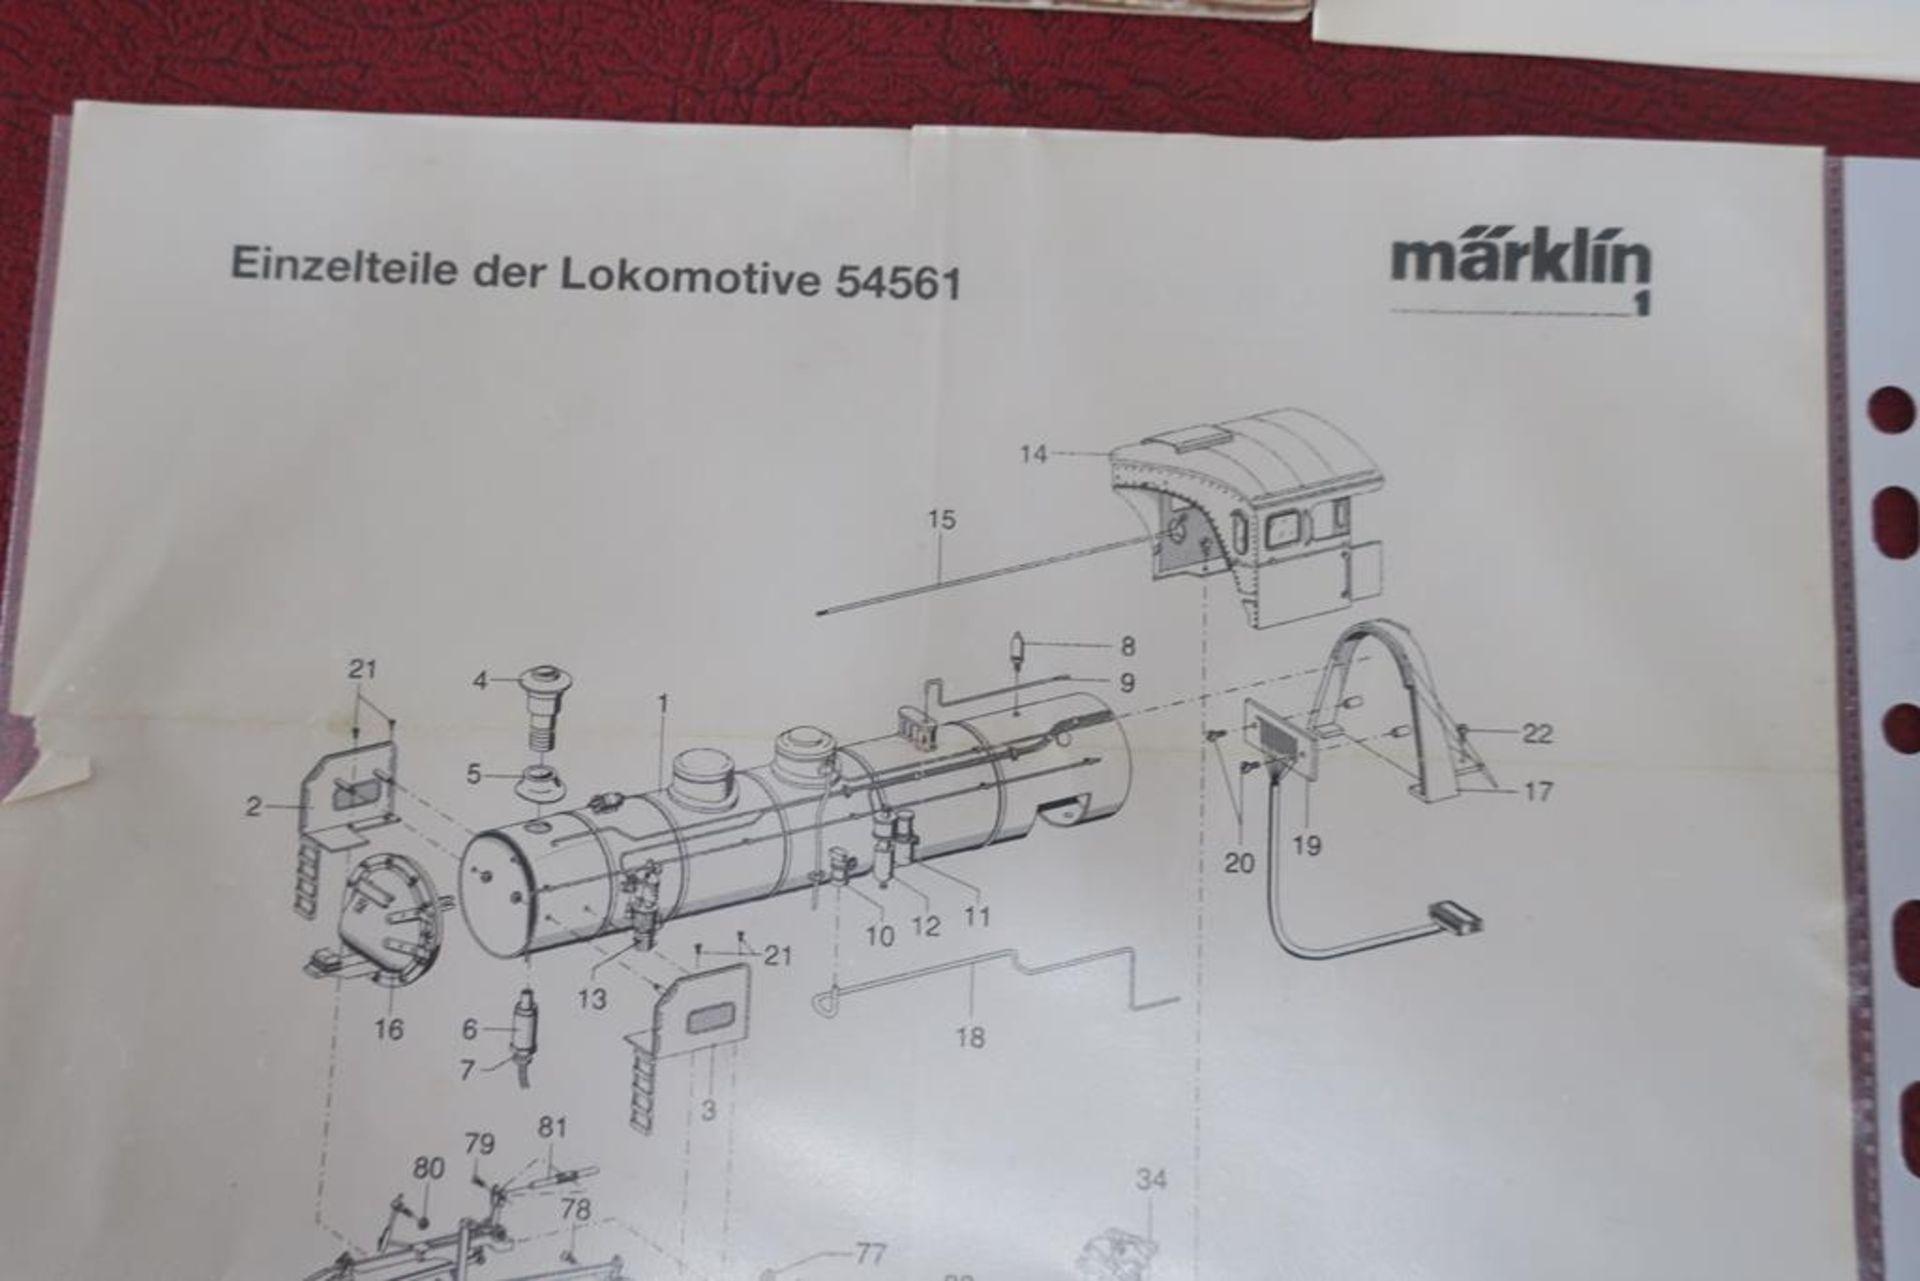 Lot 1071 - Marklin Maxi 54562 - Gauge 1 - Locomotive & Tender with Sound